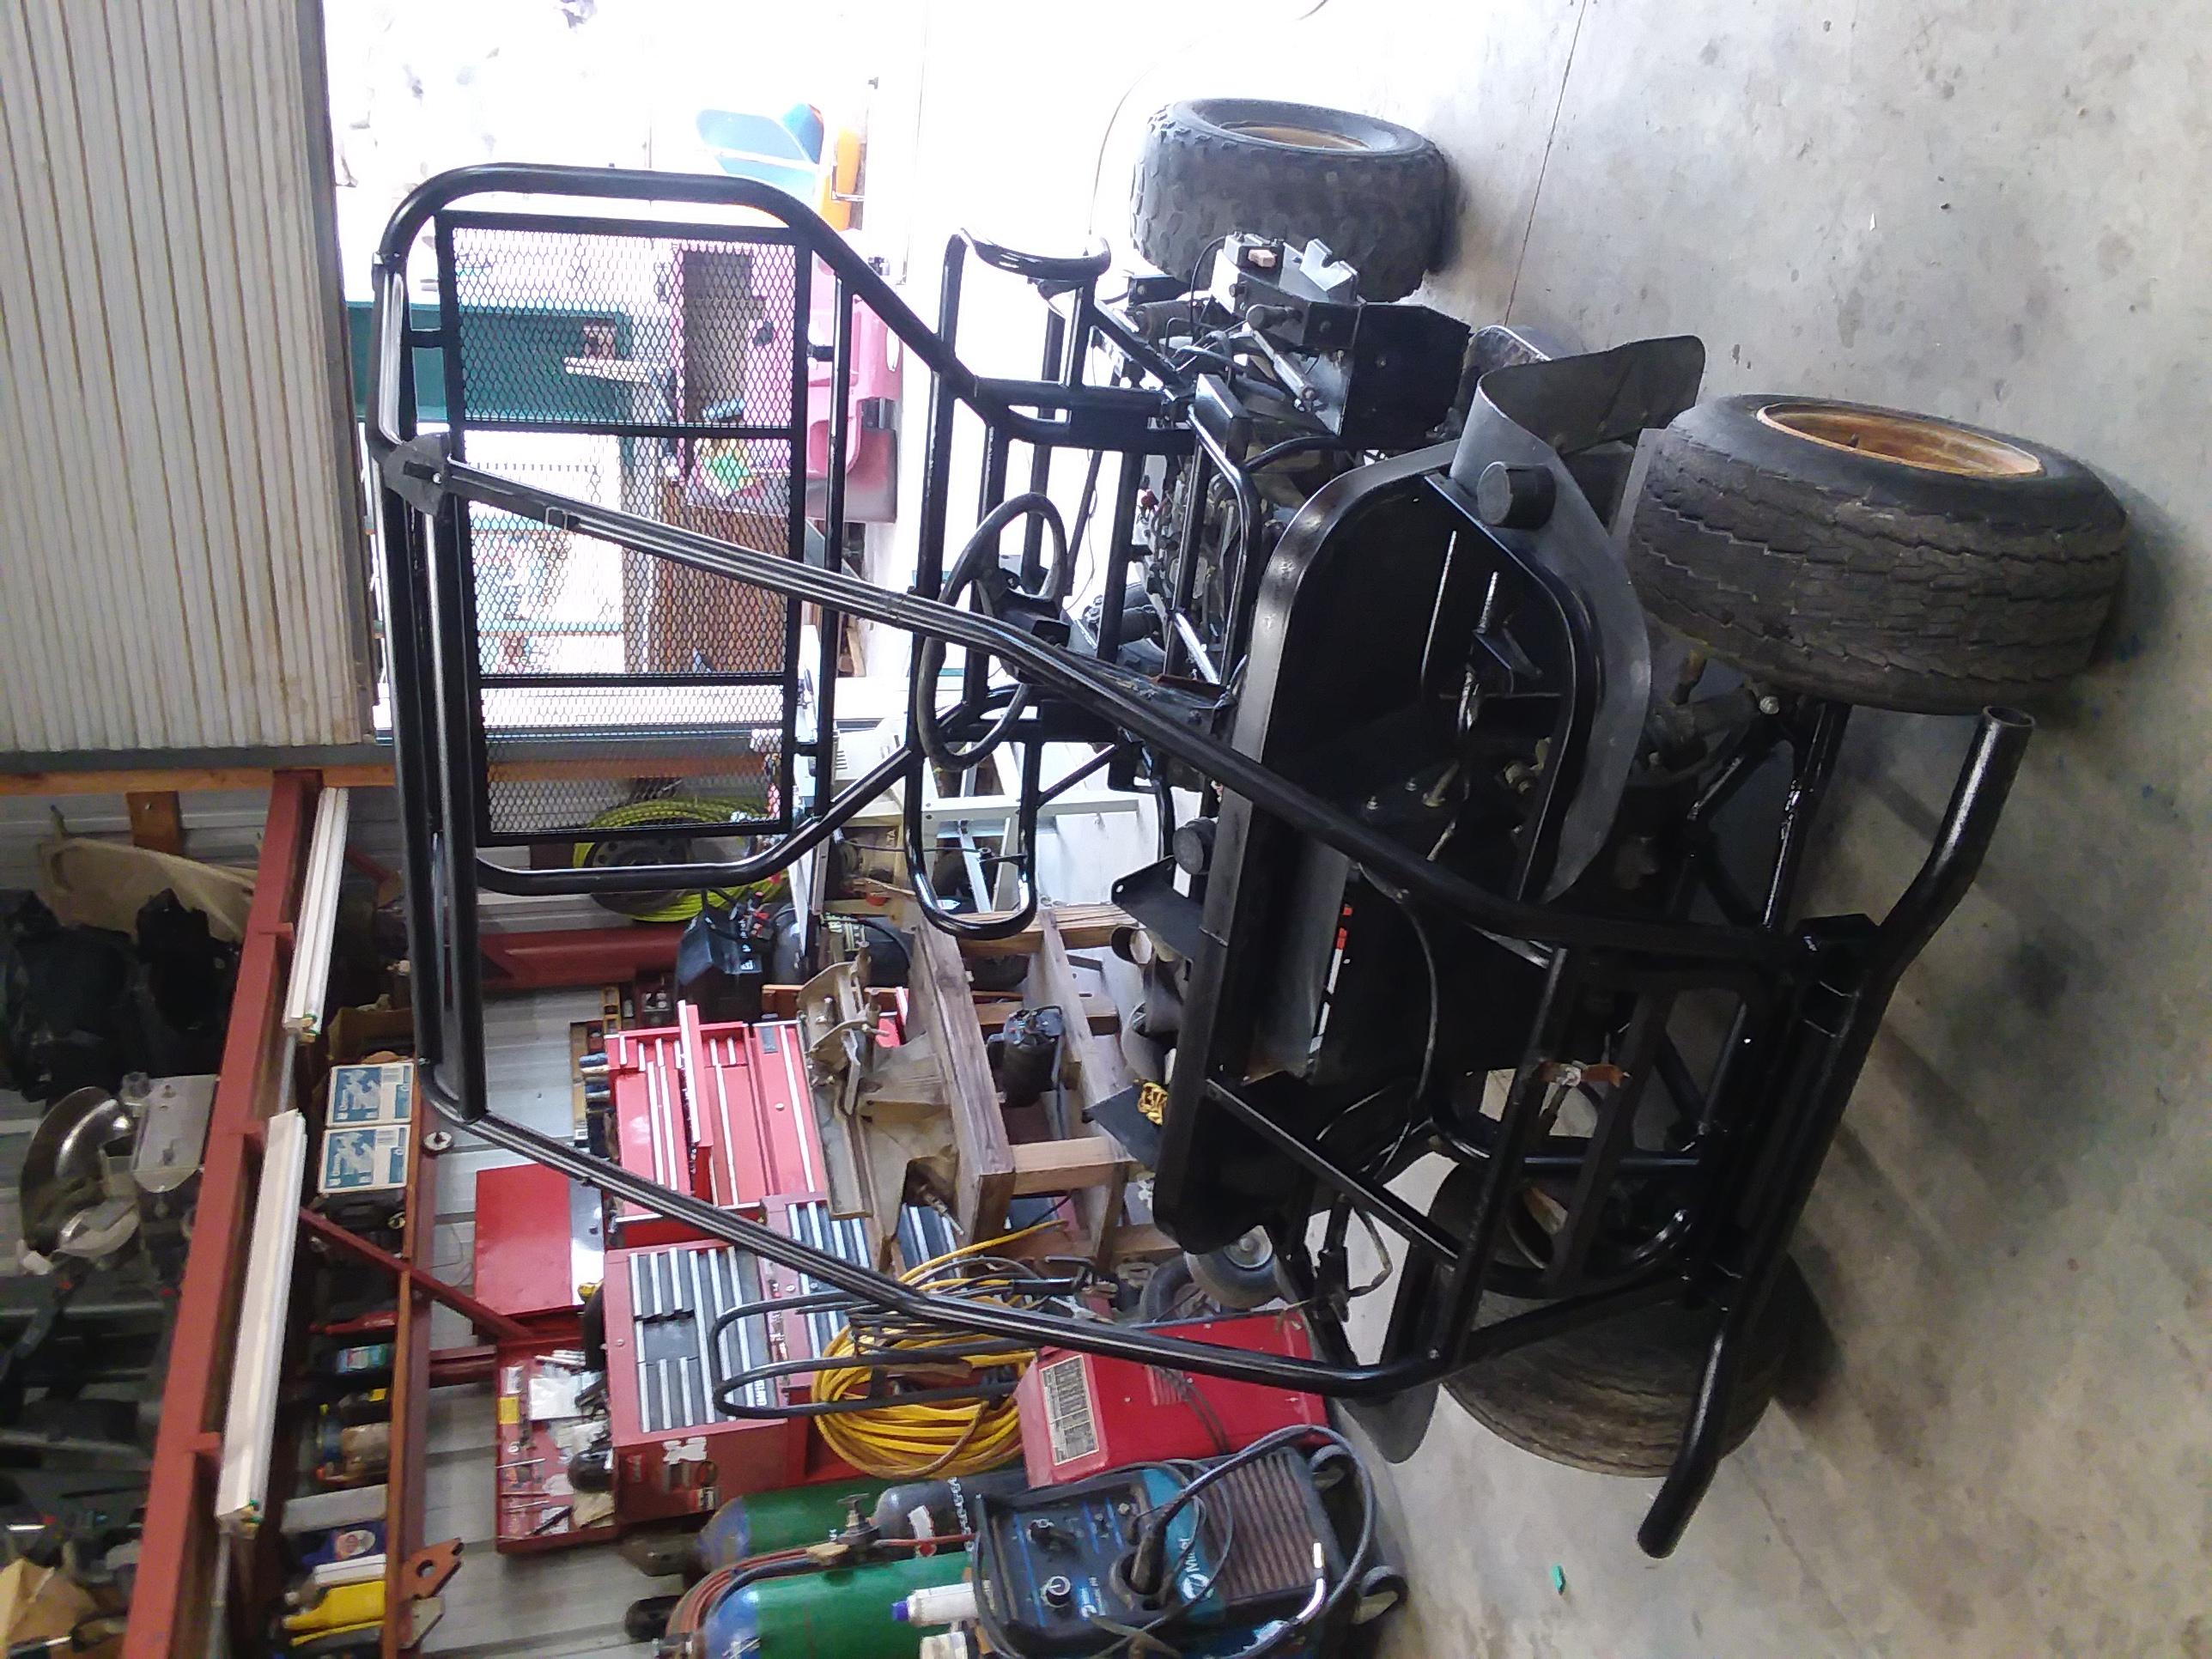 Kawasaki Mule Kaf300 Wiring Diagram Trusted Diagrams 4010 Electrical Harness Kaf300c 550 Block And Schematic Kaf 300a I